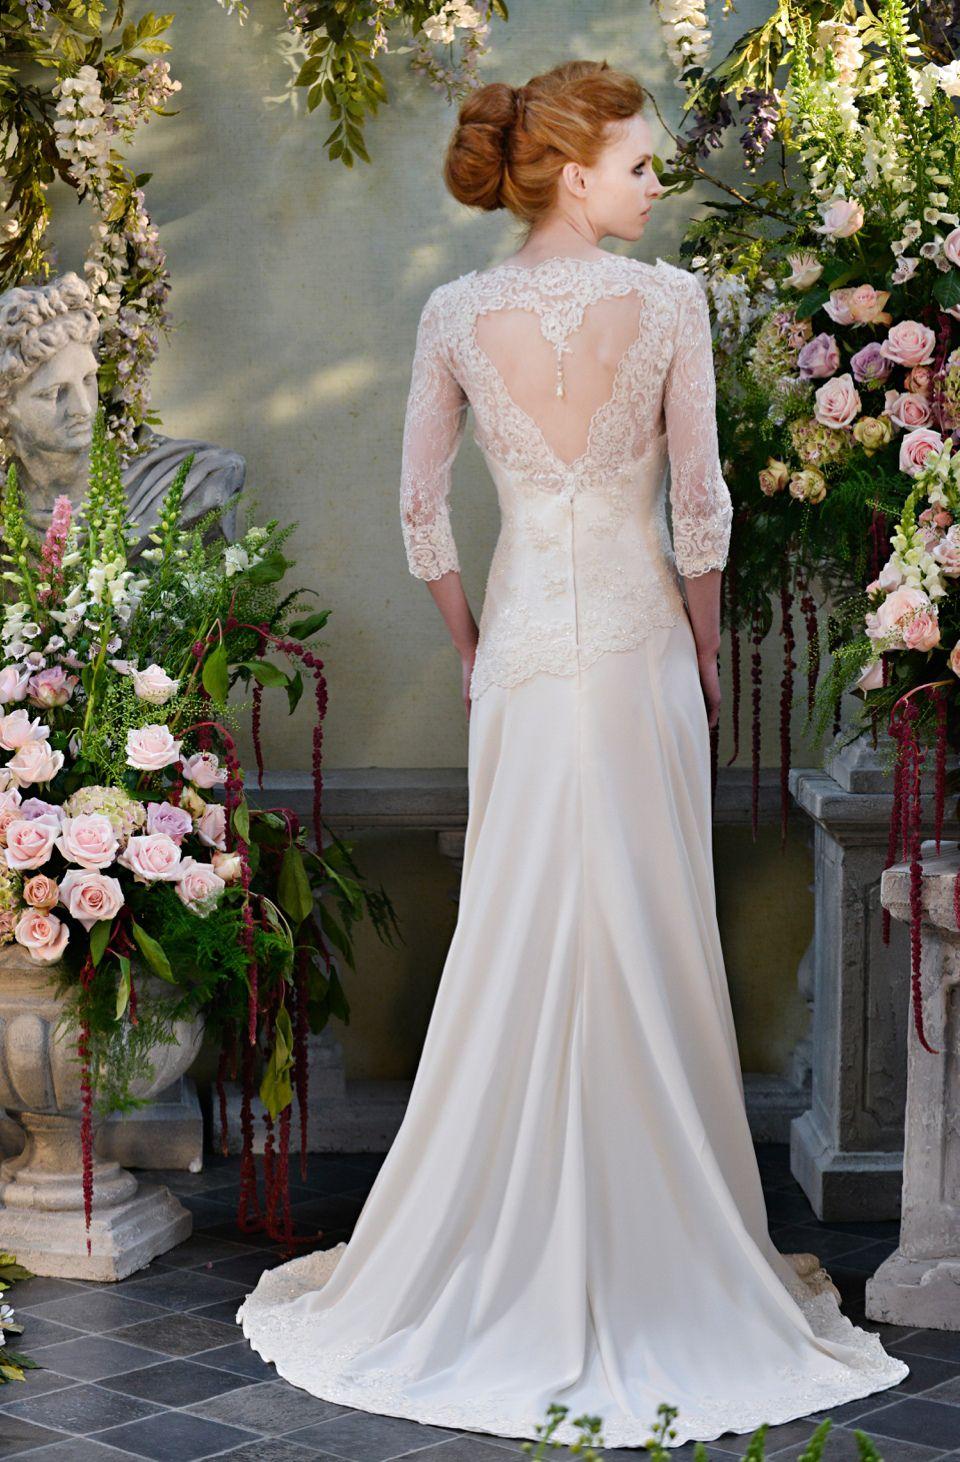 Elegant wedding dresses for mature brides   Elegant Long Sleeve Wedding Dresses  Wedding Dresses for the